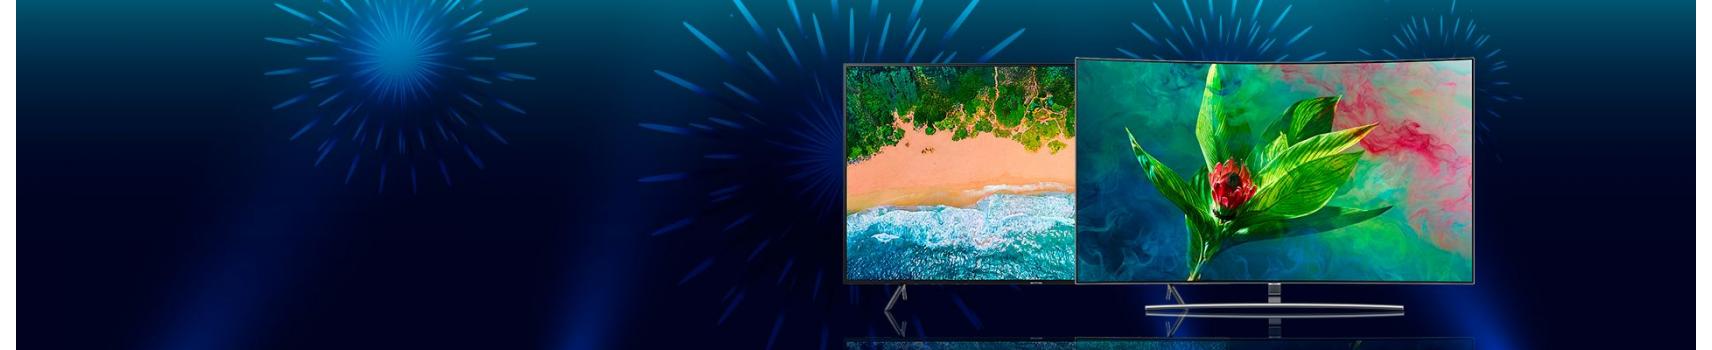 Promo TV Samsung Samrt 4K - UHD - QLED - Full HD | Samsung Tunisie